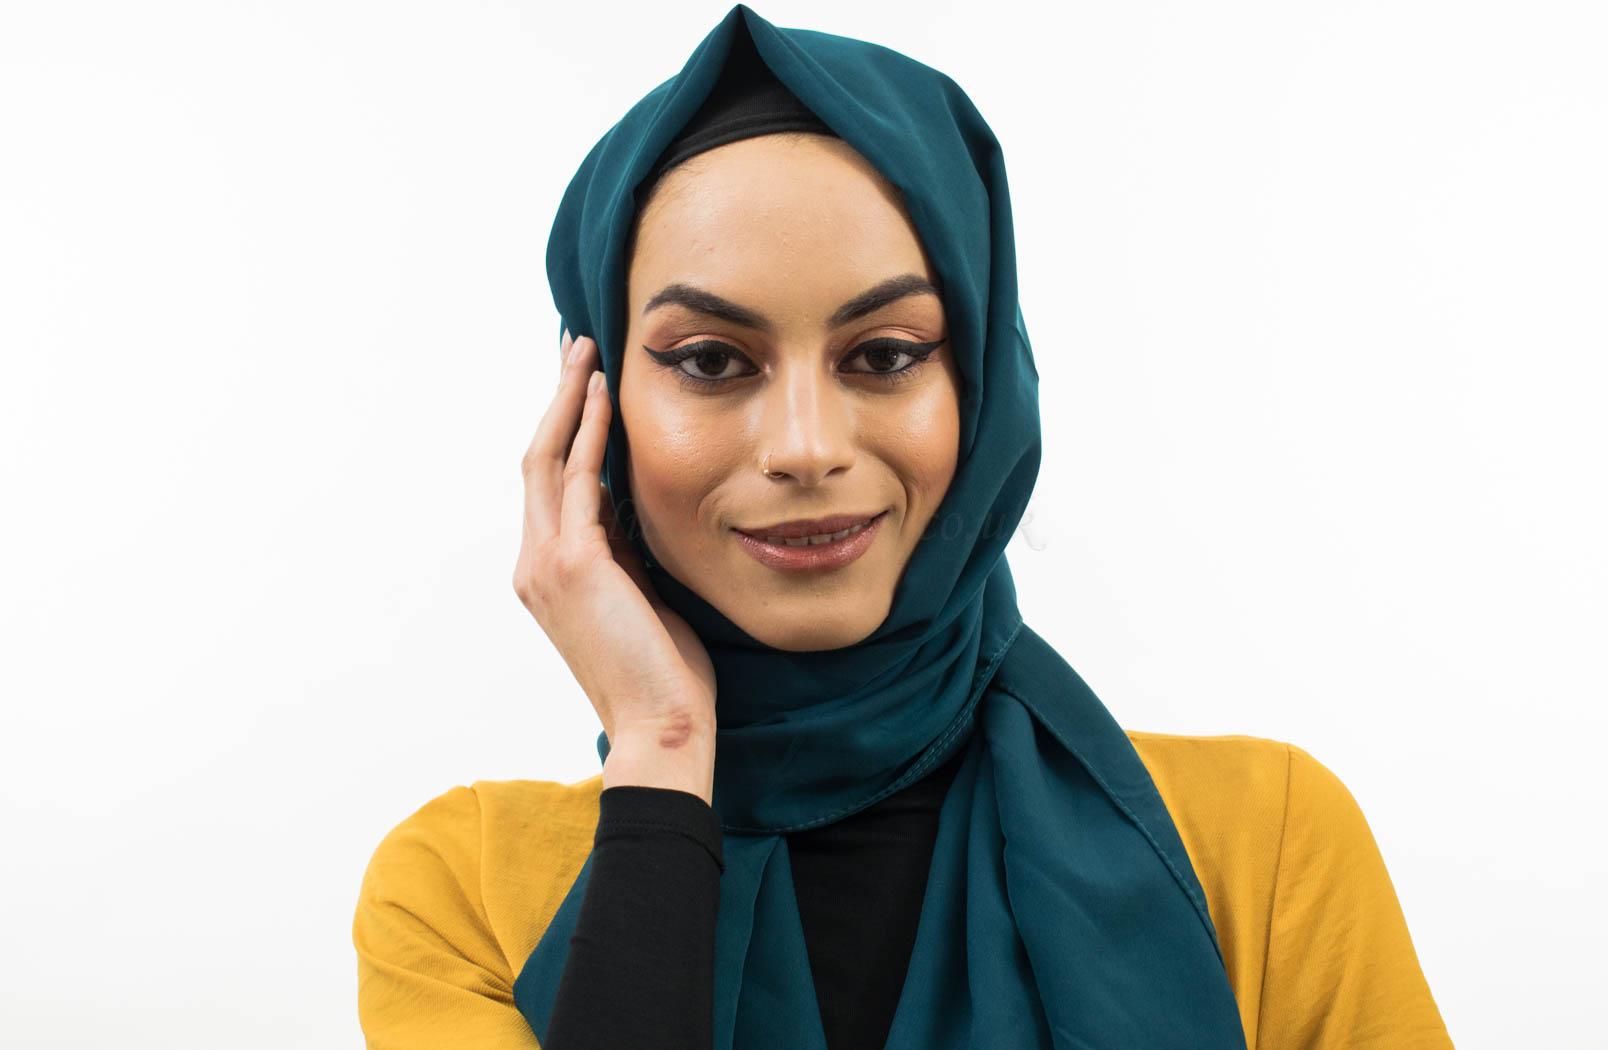 Everyday Chiffon-like Hijab deep teal